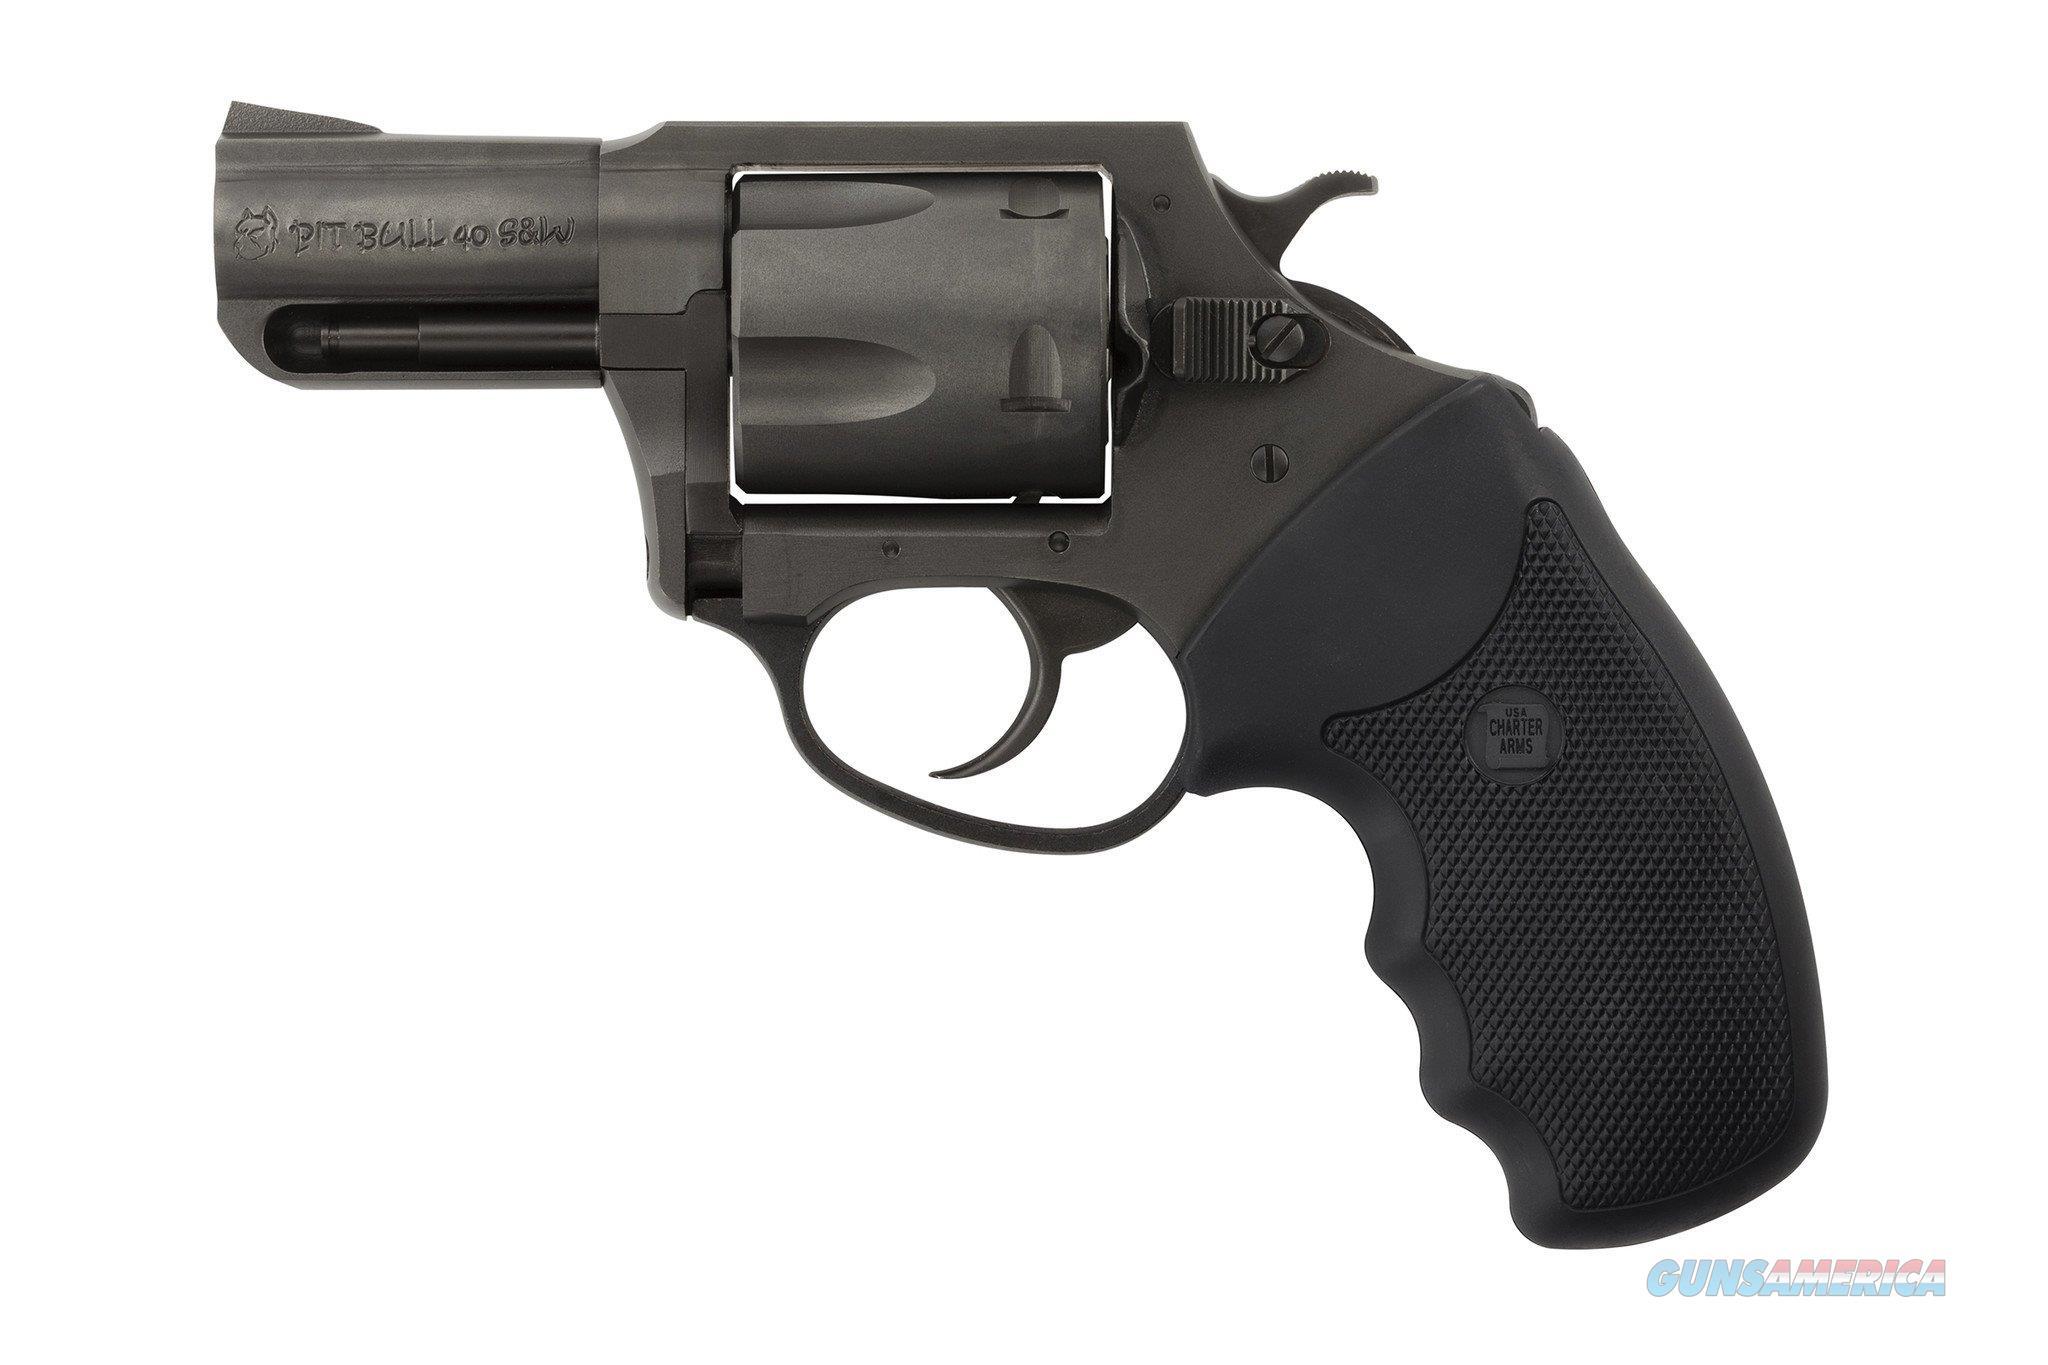 "Charter Arms Pitbull Revolver .40 S&W 2.3"" Blacknitride 5-Shot 64020   Guns > Pistols > Charter Arms Revolvers"